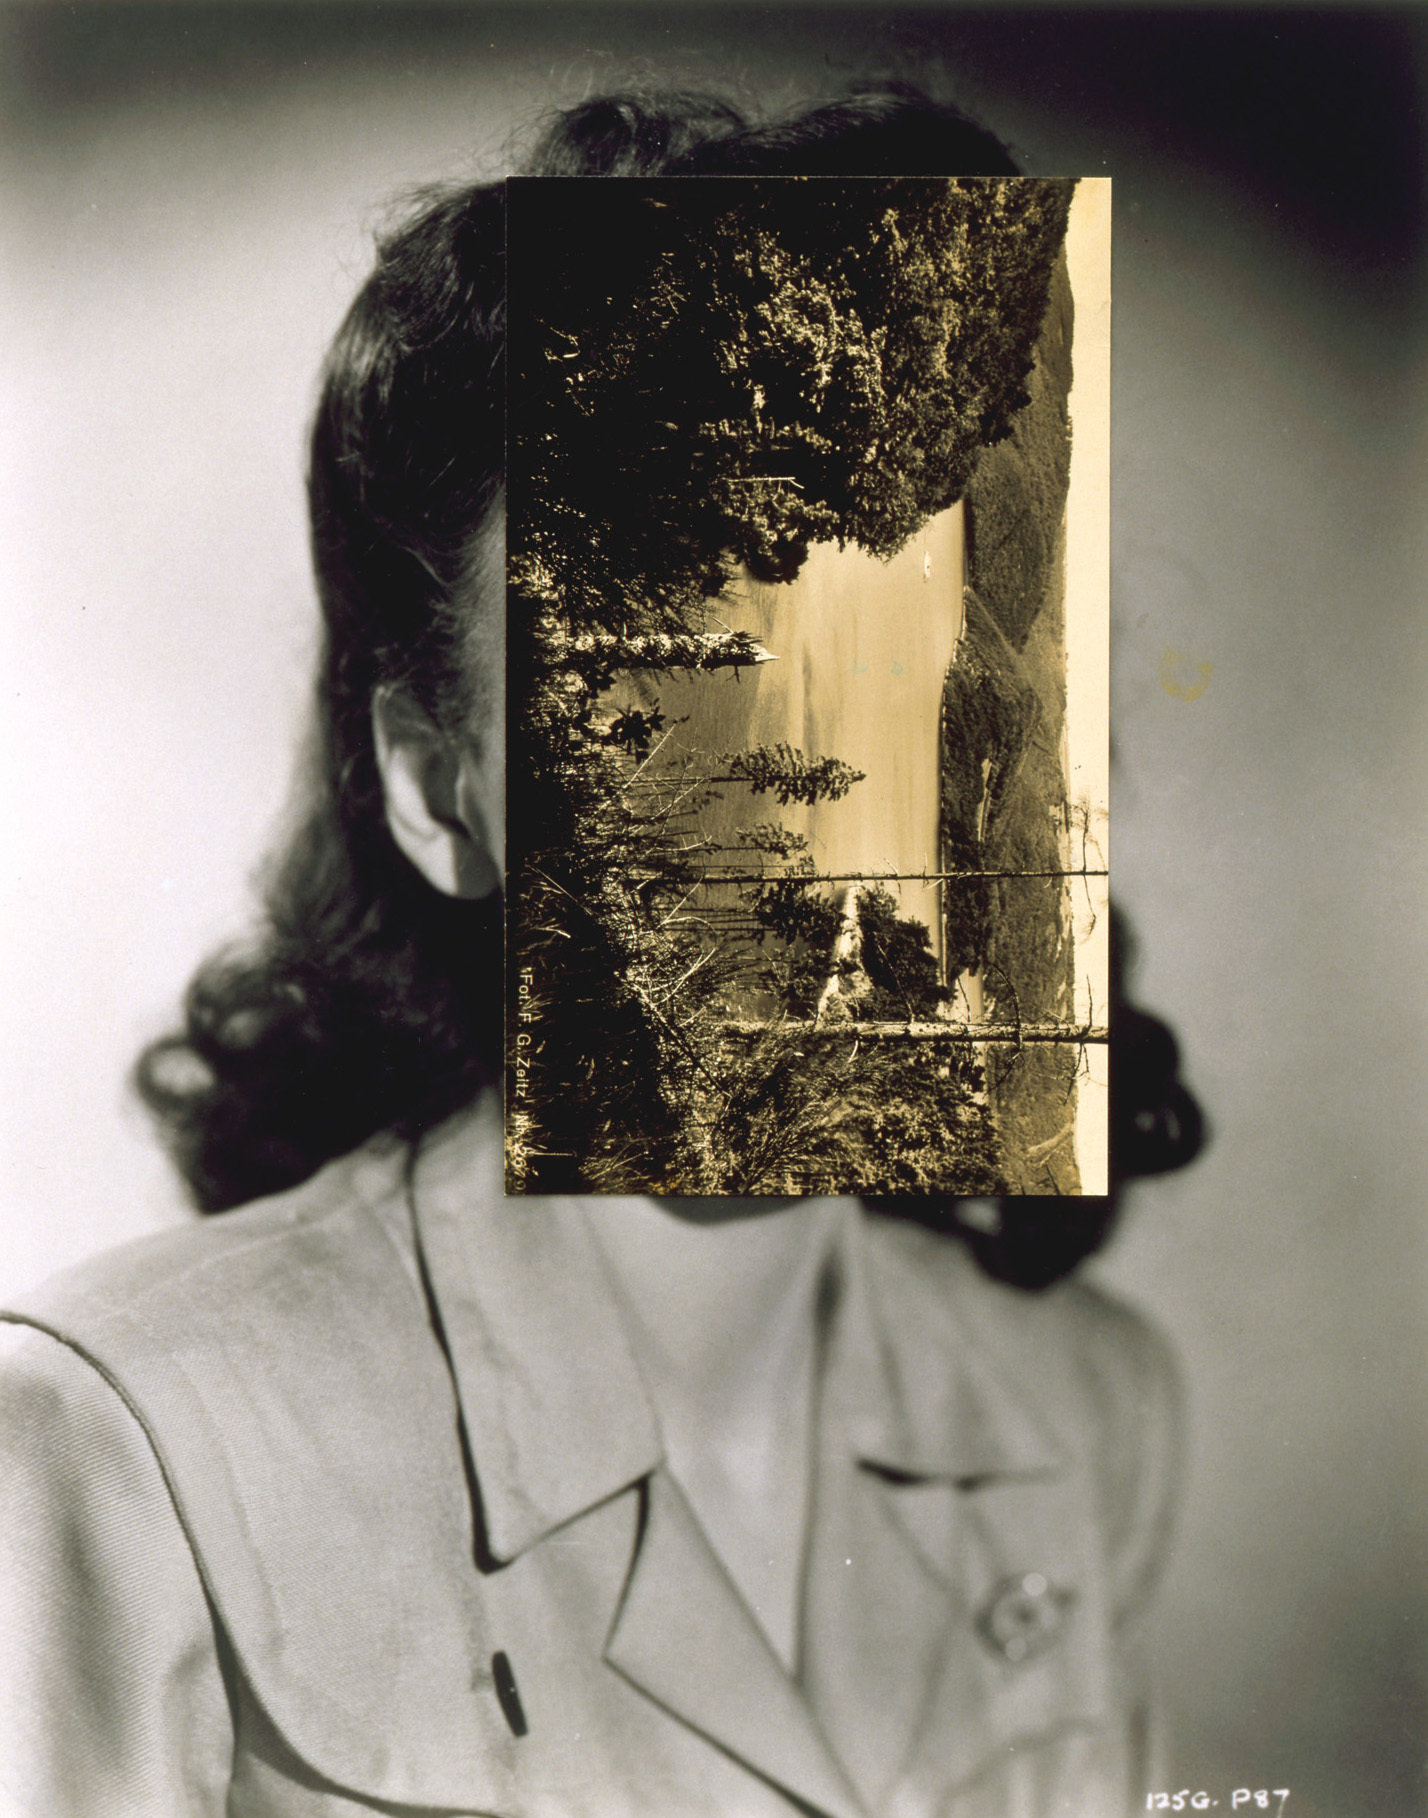 'Mask XXVI' by John Stezaker, 2006. Courtesy of the Museum of Modern Art.